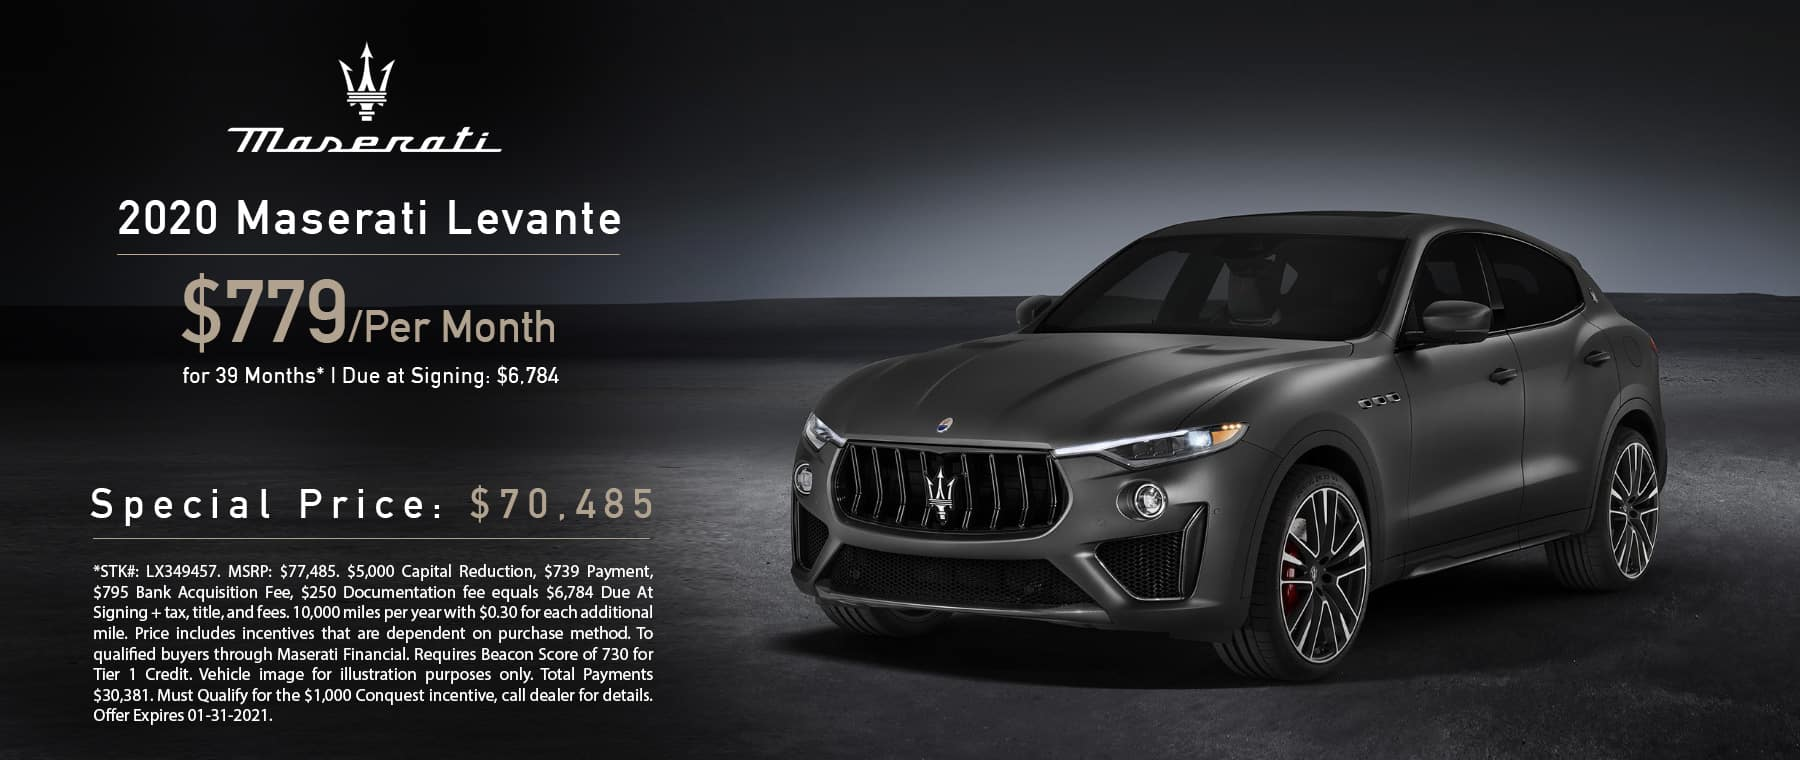 Maserati_2020_Levante_Slide_Jan2021_1